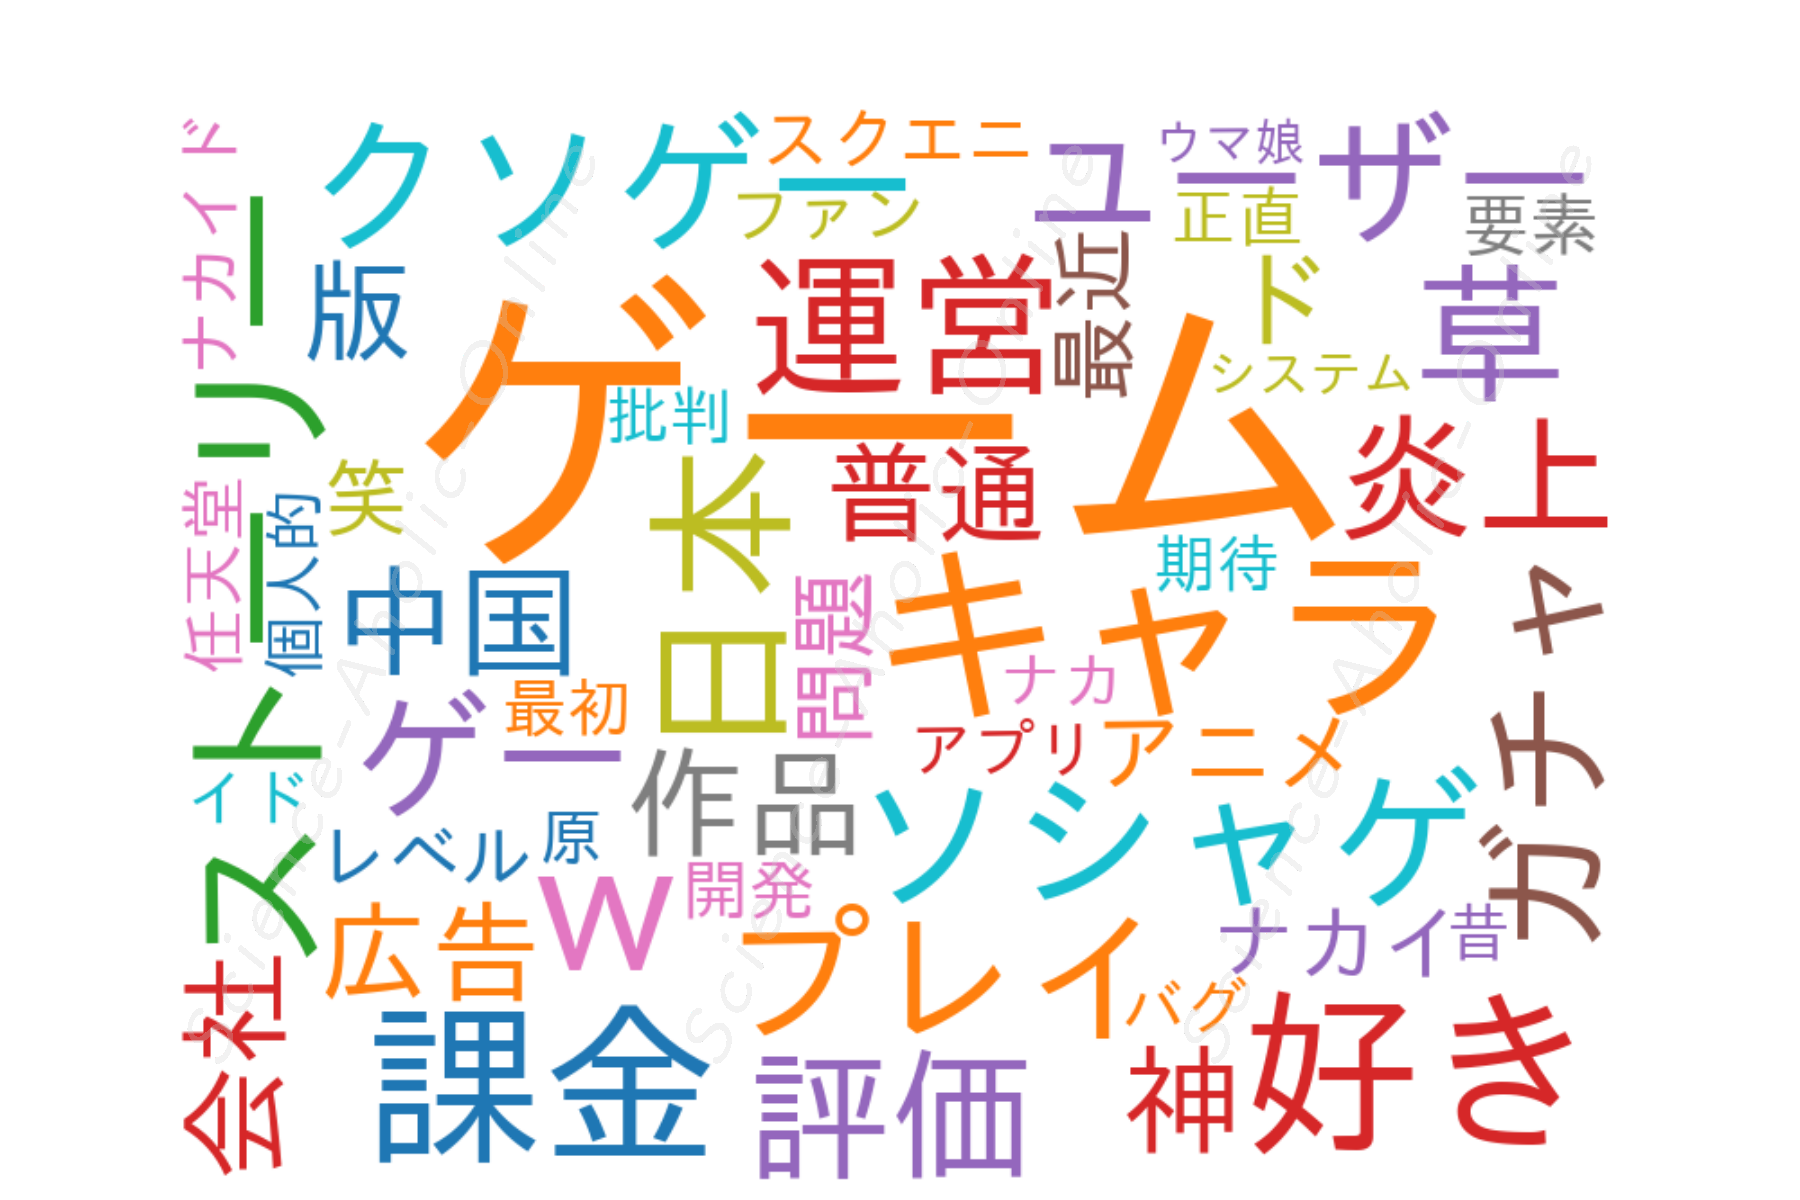 wordcloud_ナカイドのゲーム情報チャンネル【辛口】